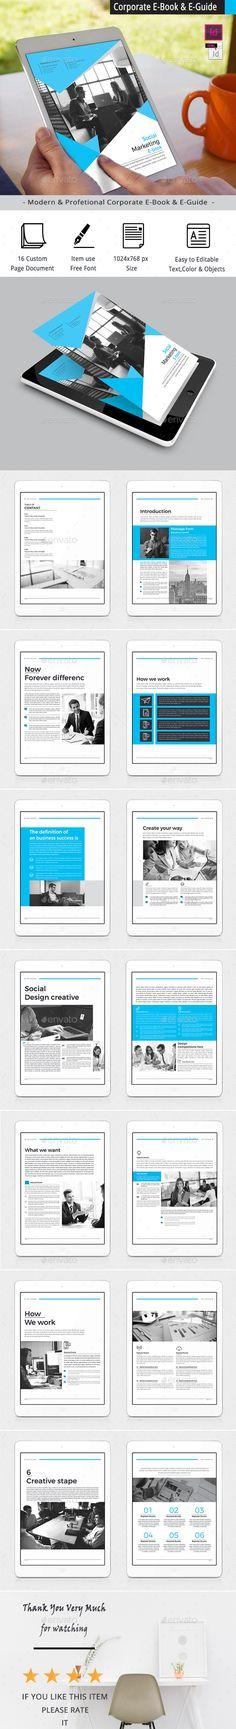 Corporate E-Book & E-Guide Template InDesign INDD